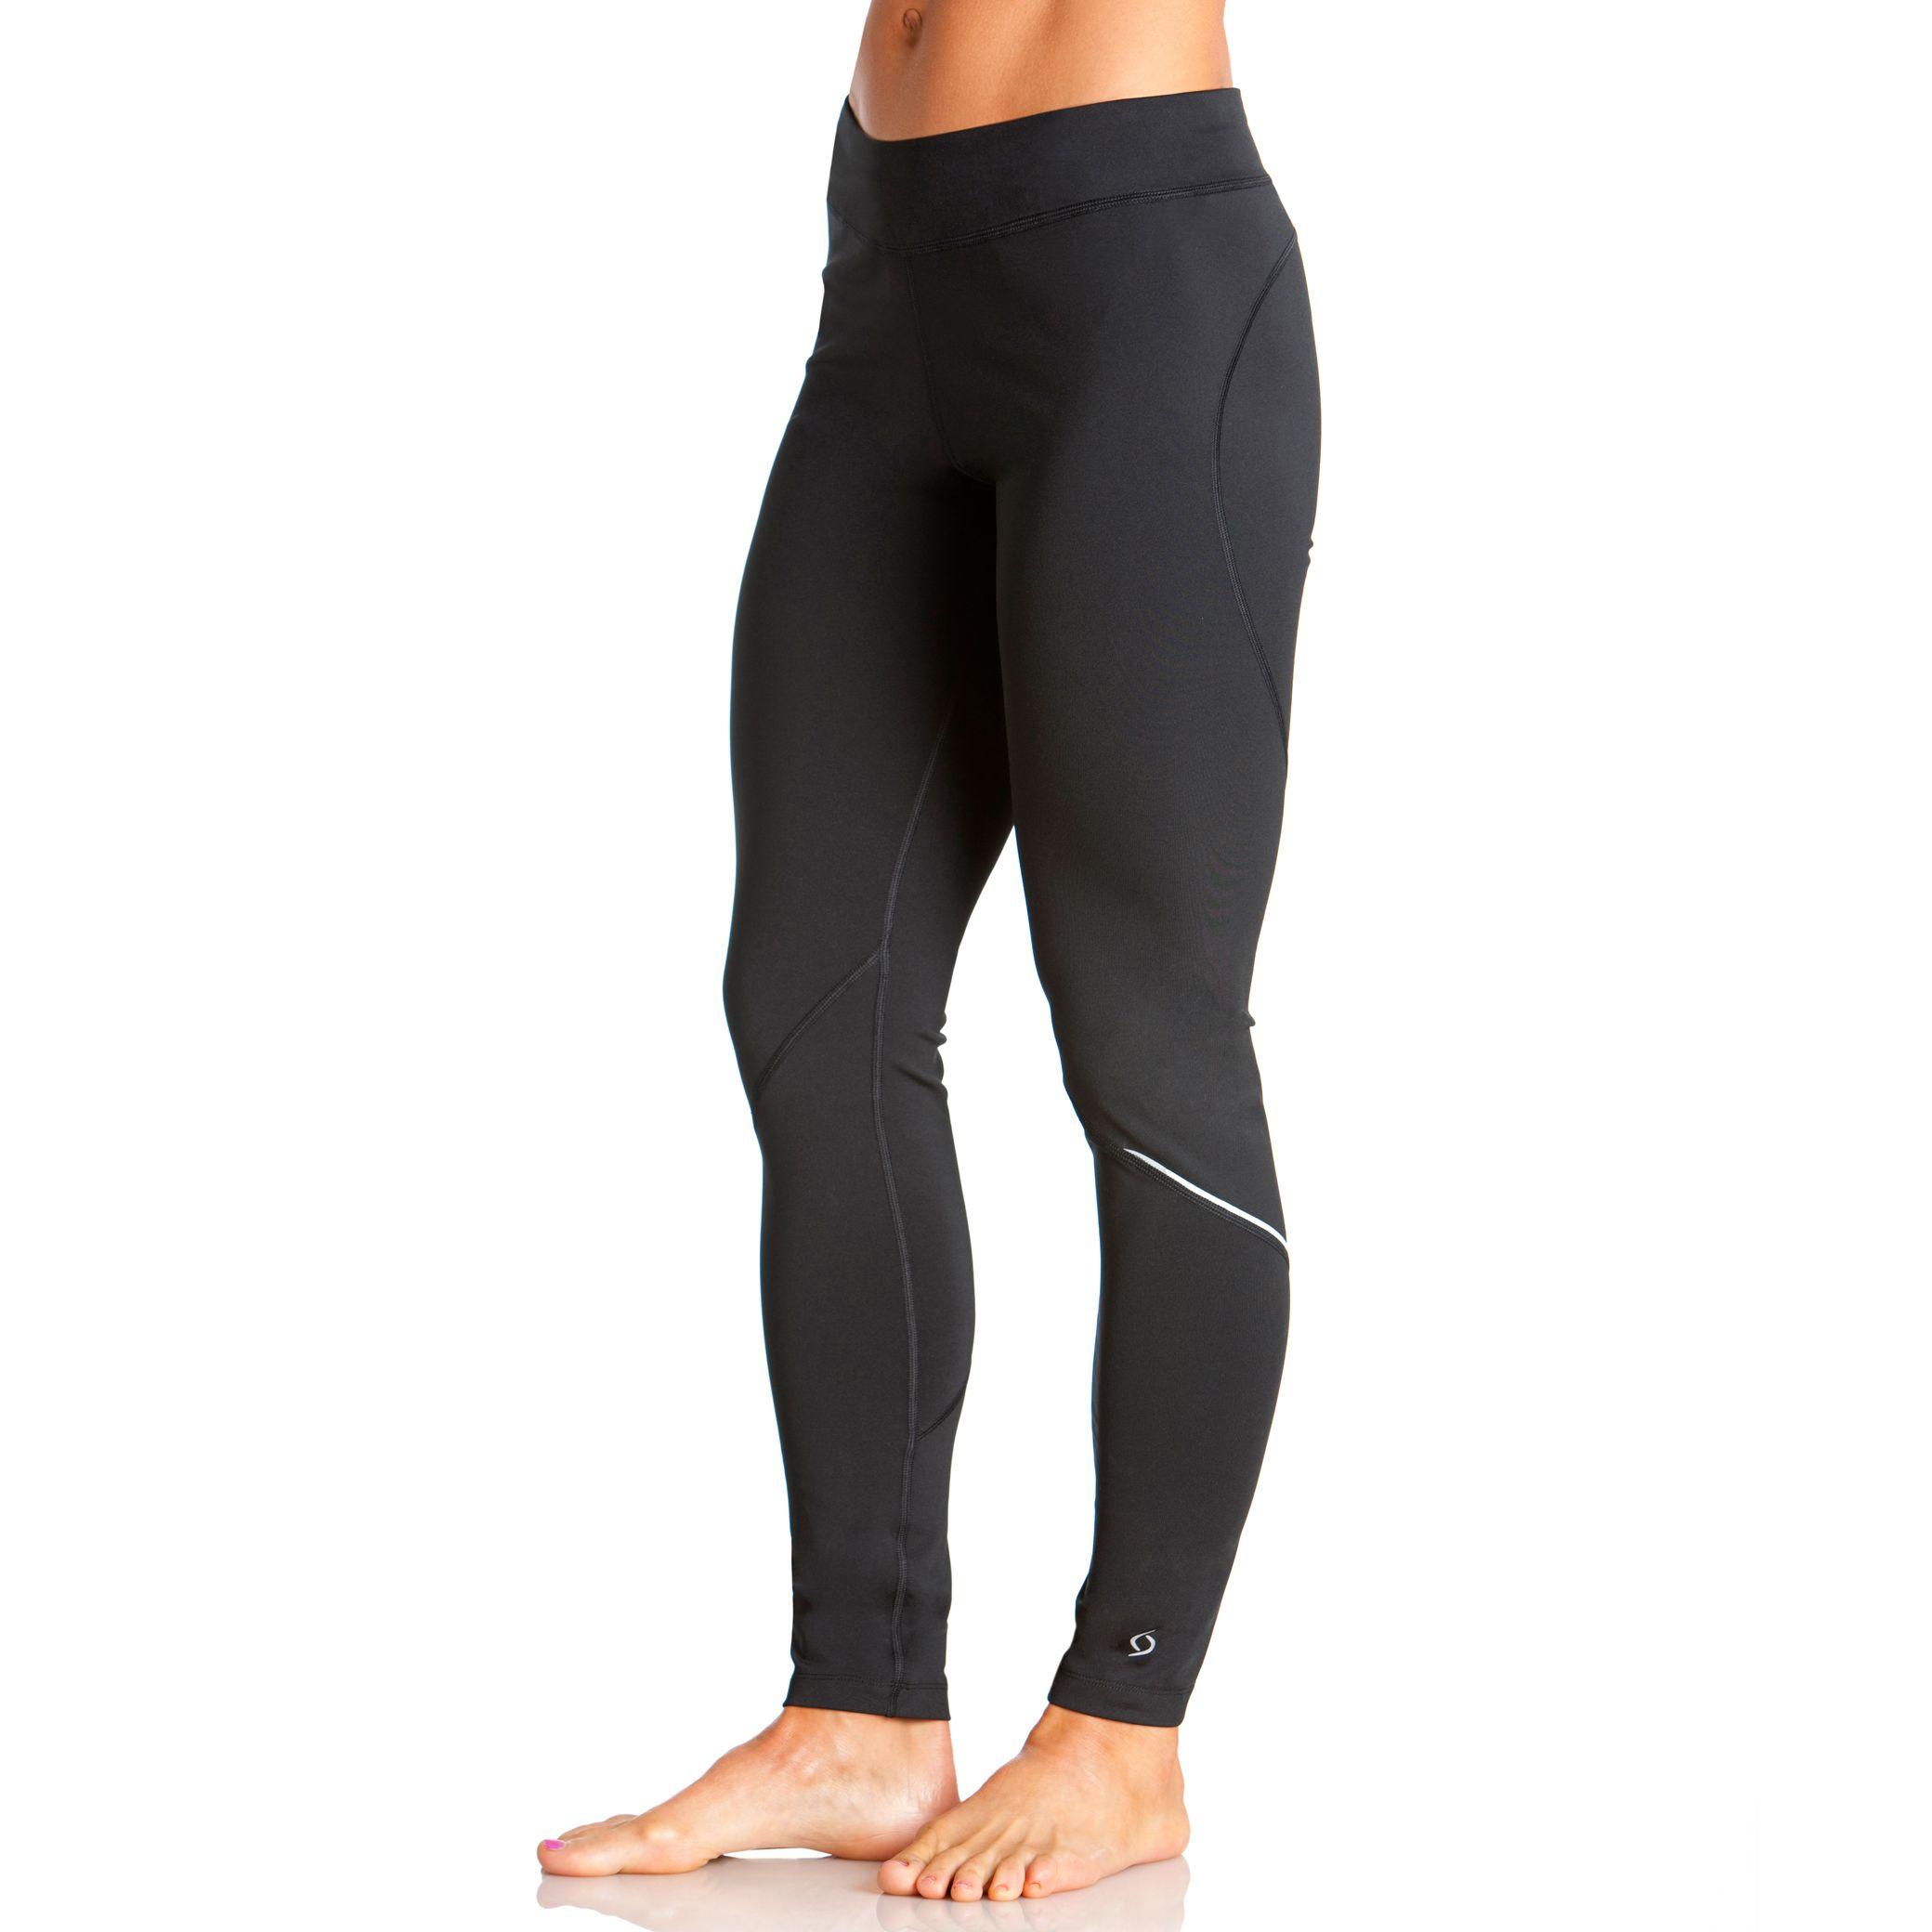 leggings booty yoga comforter comfort lemonandlimecaprifront products limes lemon capri fruity pants lime lemons lavaloka fun moving